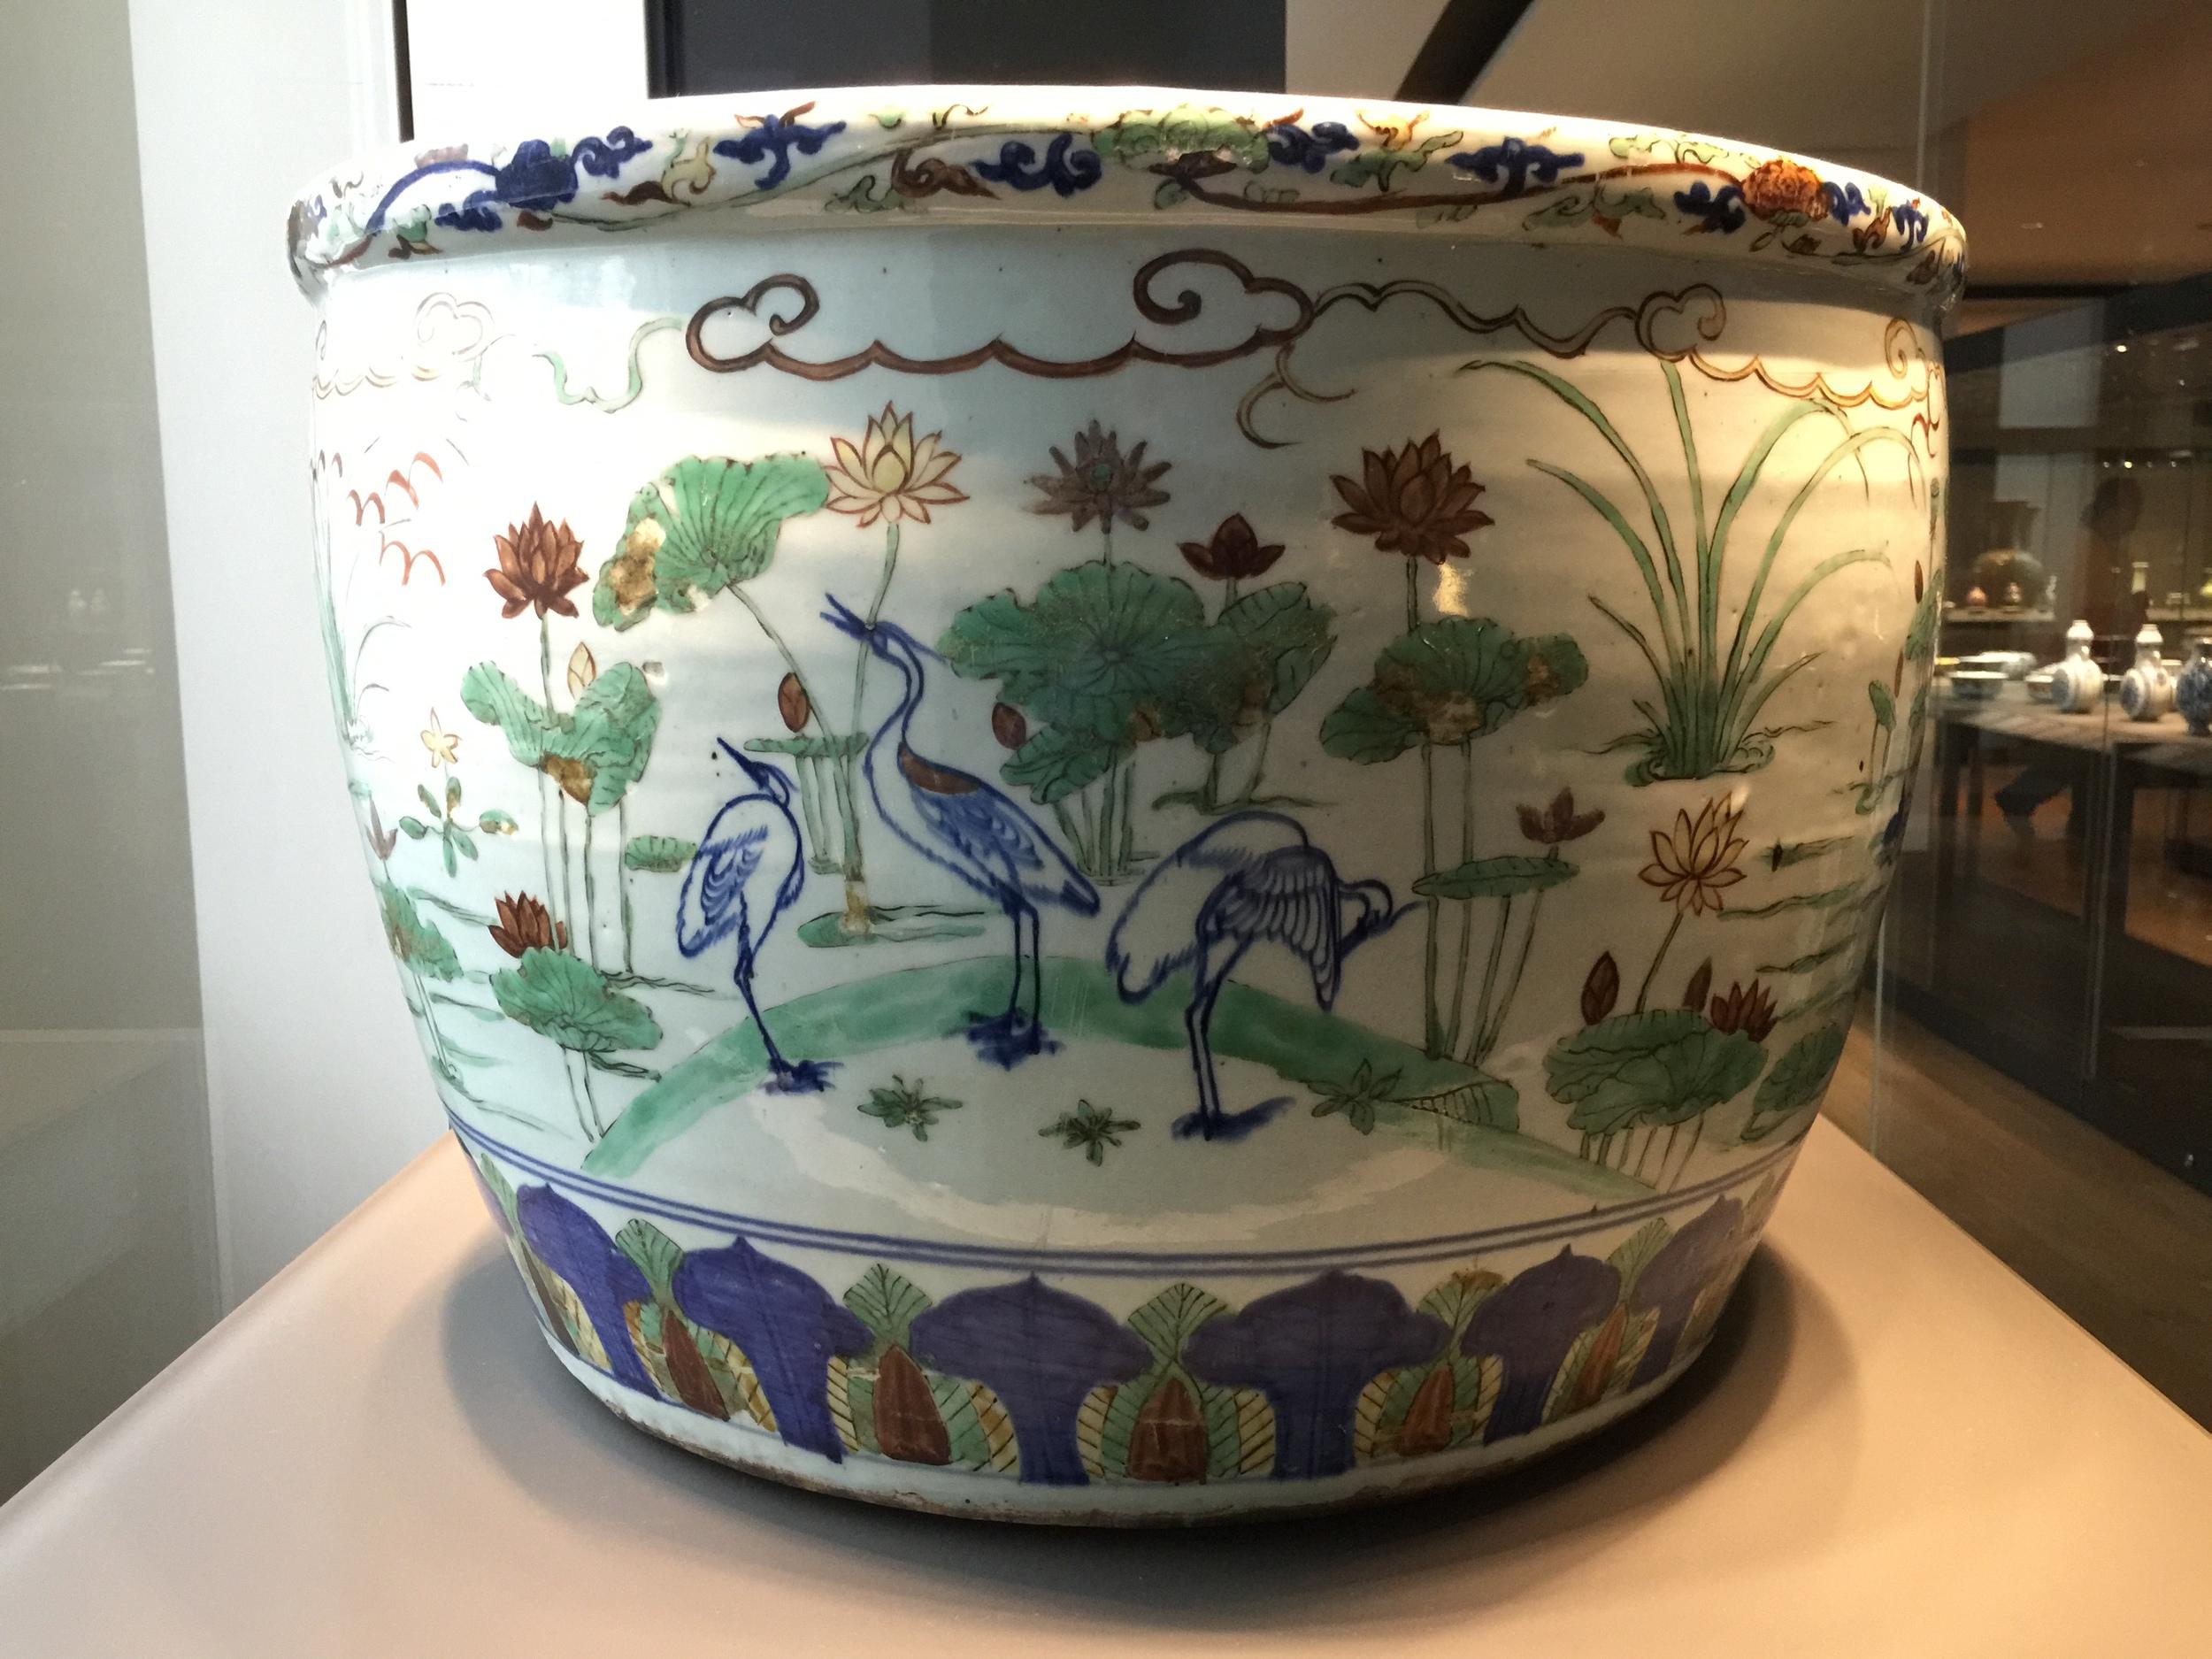 Chinese-Porcelain-British-Museum-Percival-David-jessewaugh.com-24.jpg